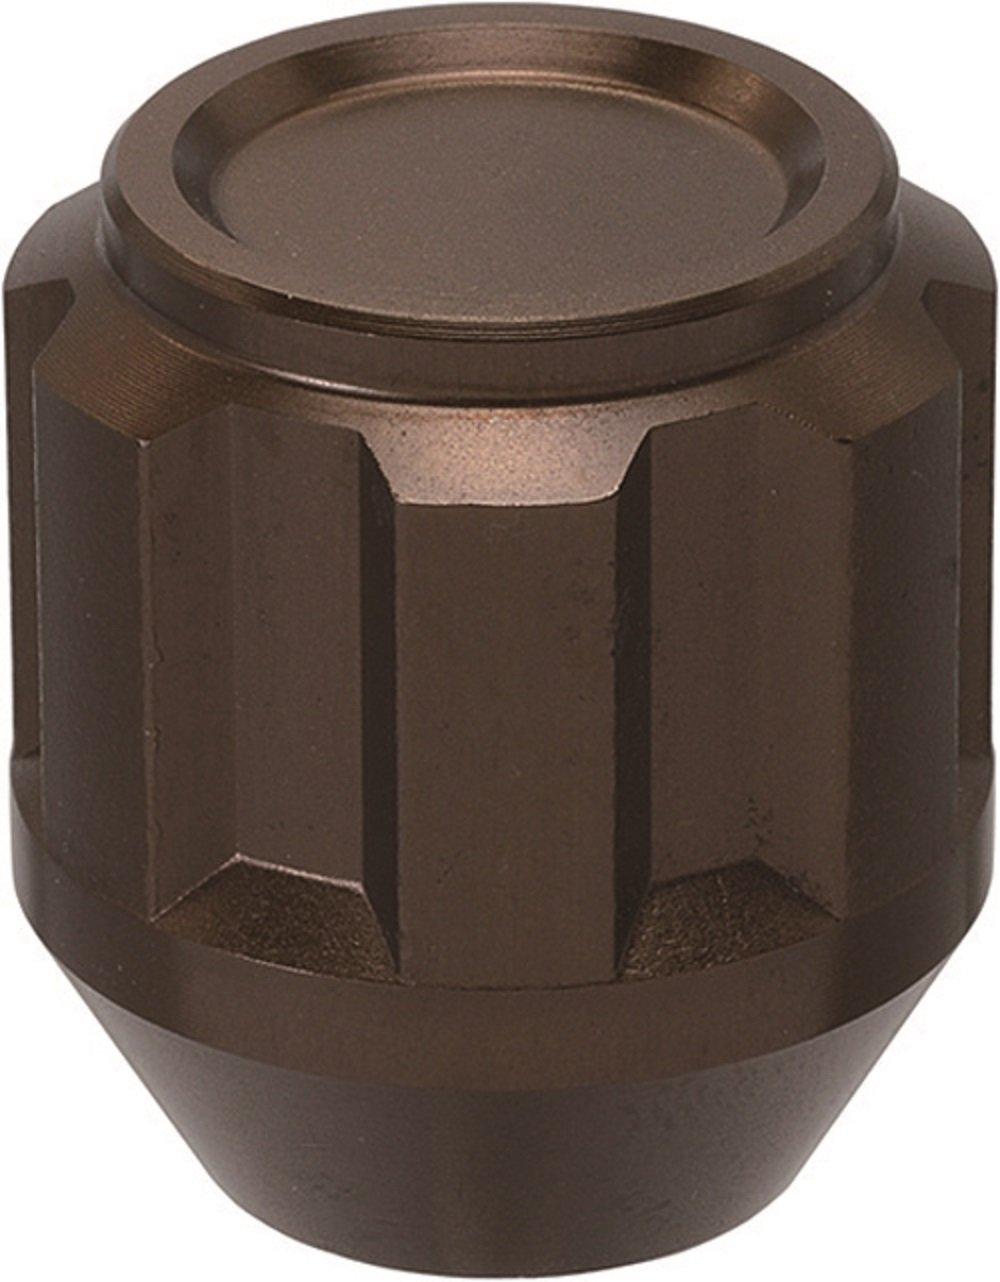 KYO-EI (協永産業)LEGGDURA RACING Compact TypeLock & Nut SetM12xP1.25 ブロンズ 16個入 KIL36B B06ZZ9ZG5J